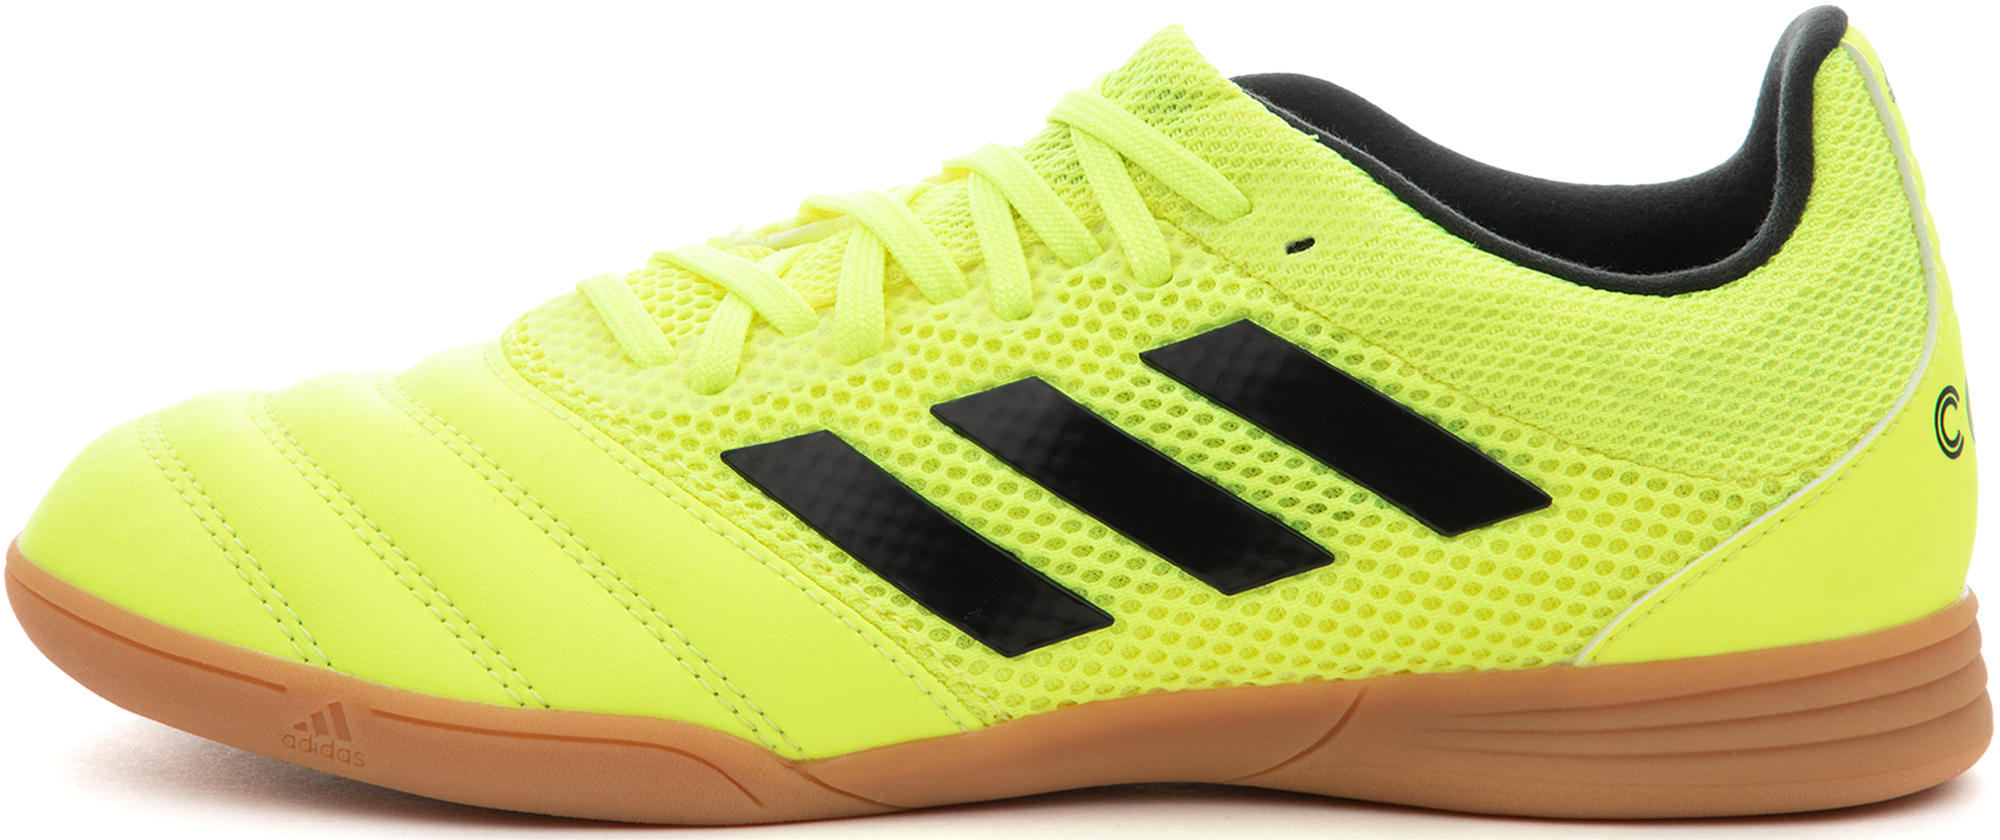 Adidas Бутсы детские Copa 19.3 IN Sala, размер 37,5